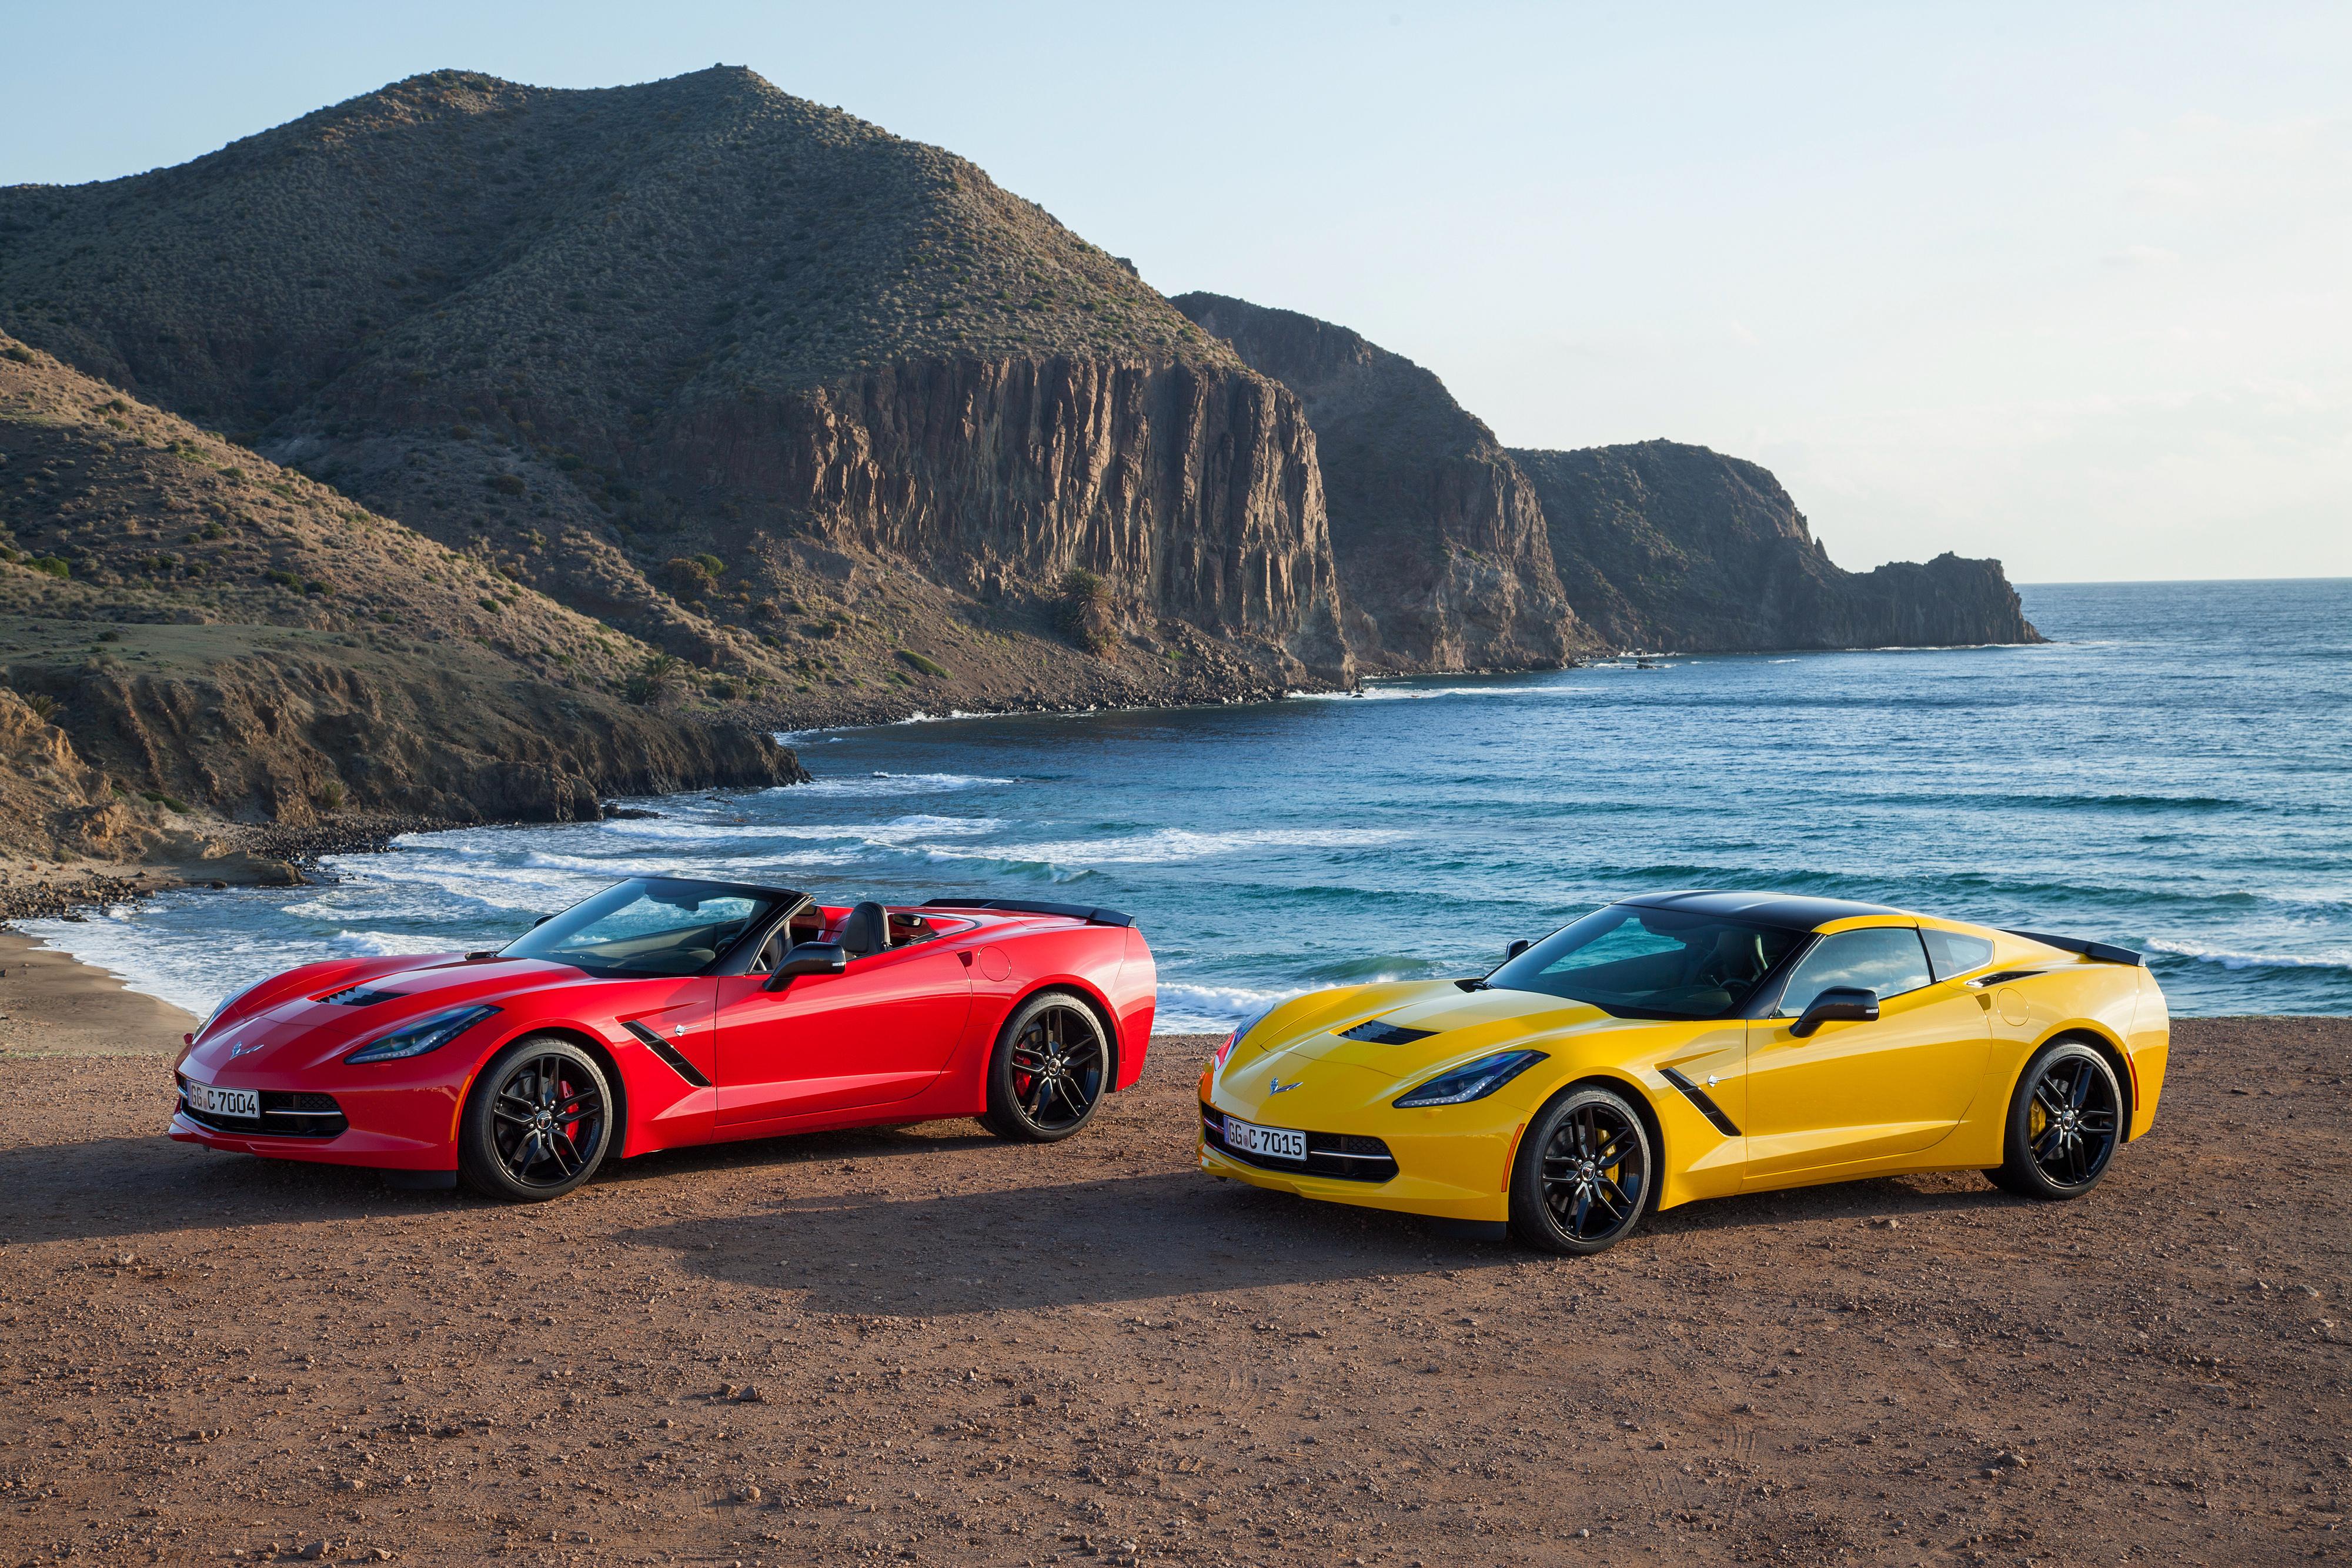 Chevrolet Corvette желтая дорога закат бесплатно